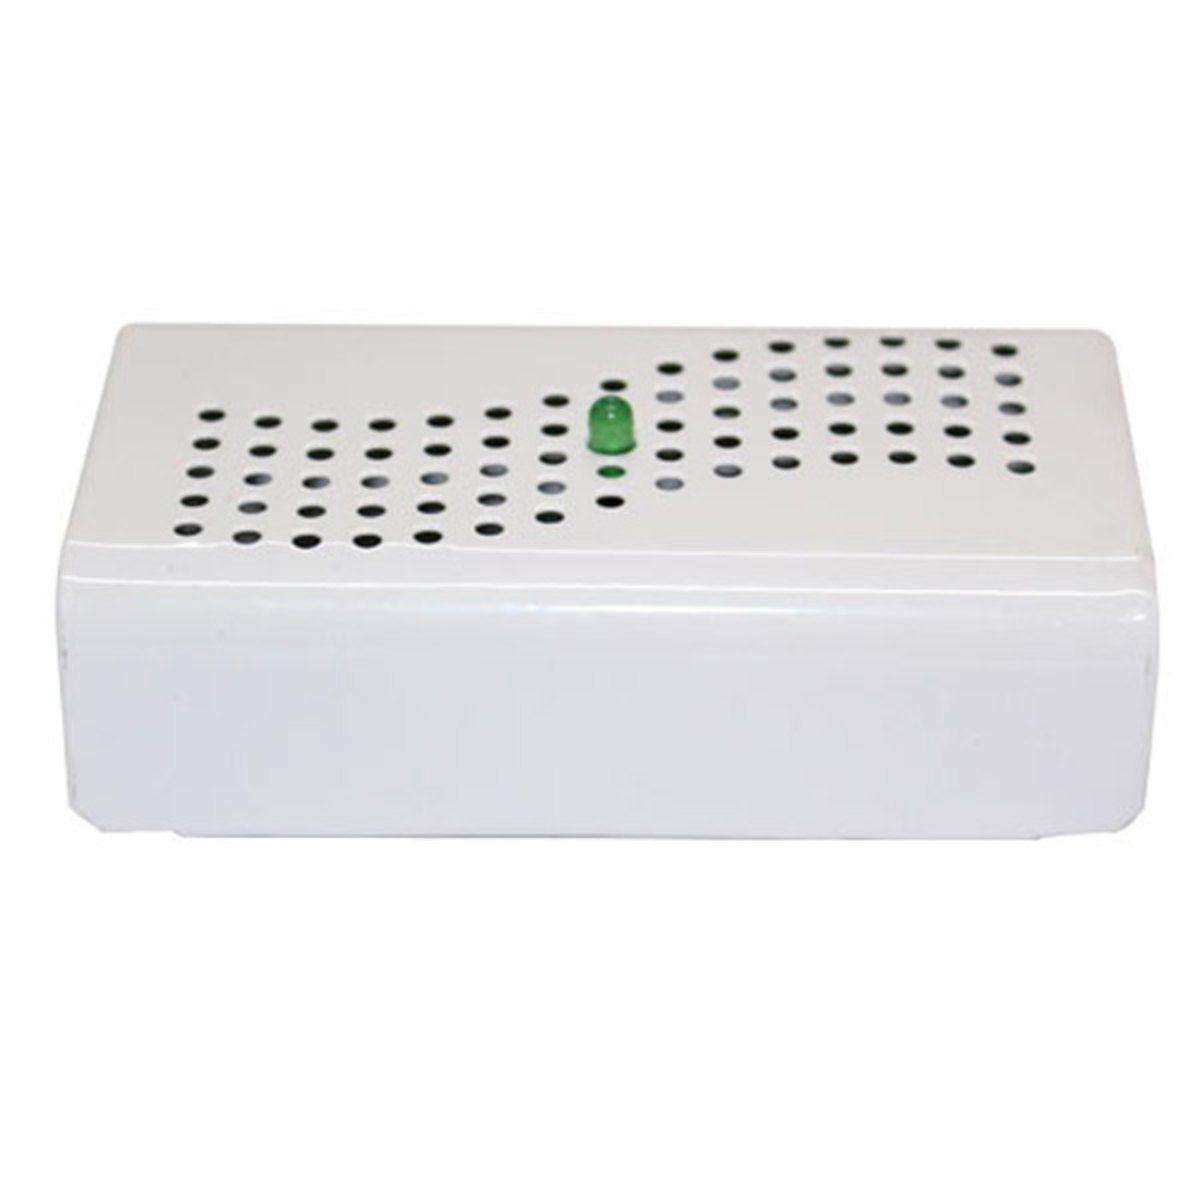 Anti Mofo Eletrônico Branco 220V 1 unid. Repel Mofo - Combate microorganismos, mofo, bolor